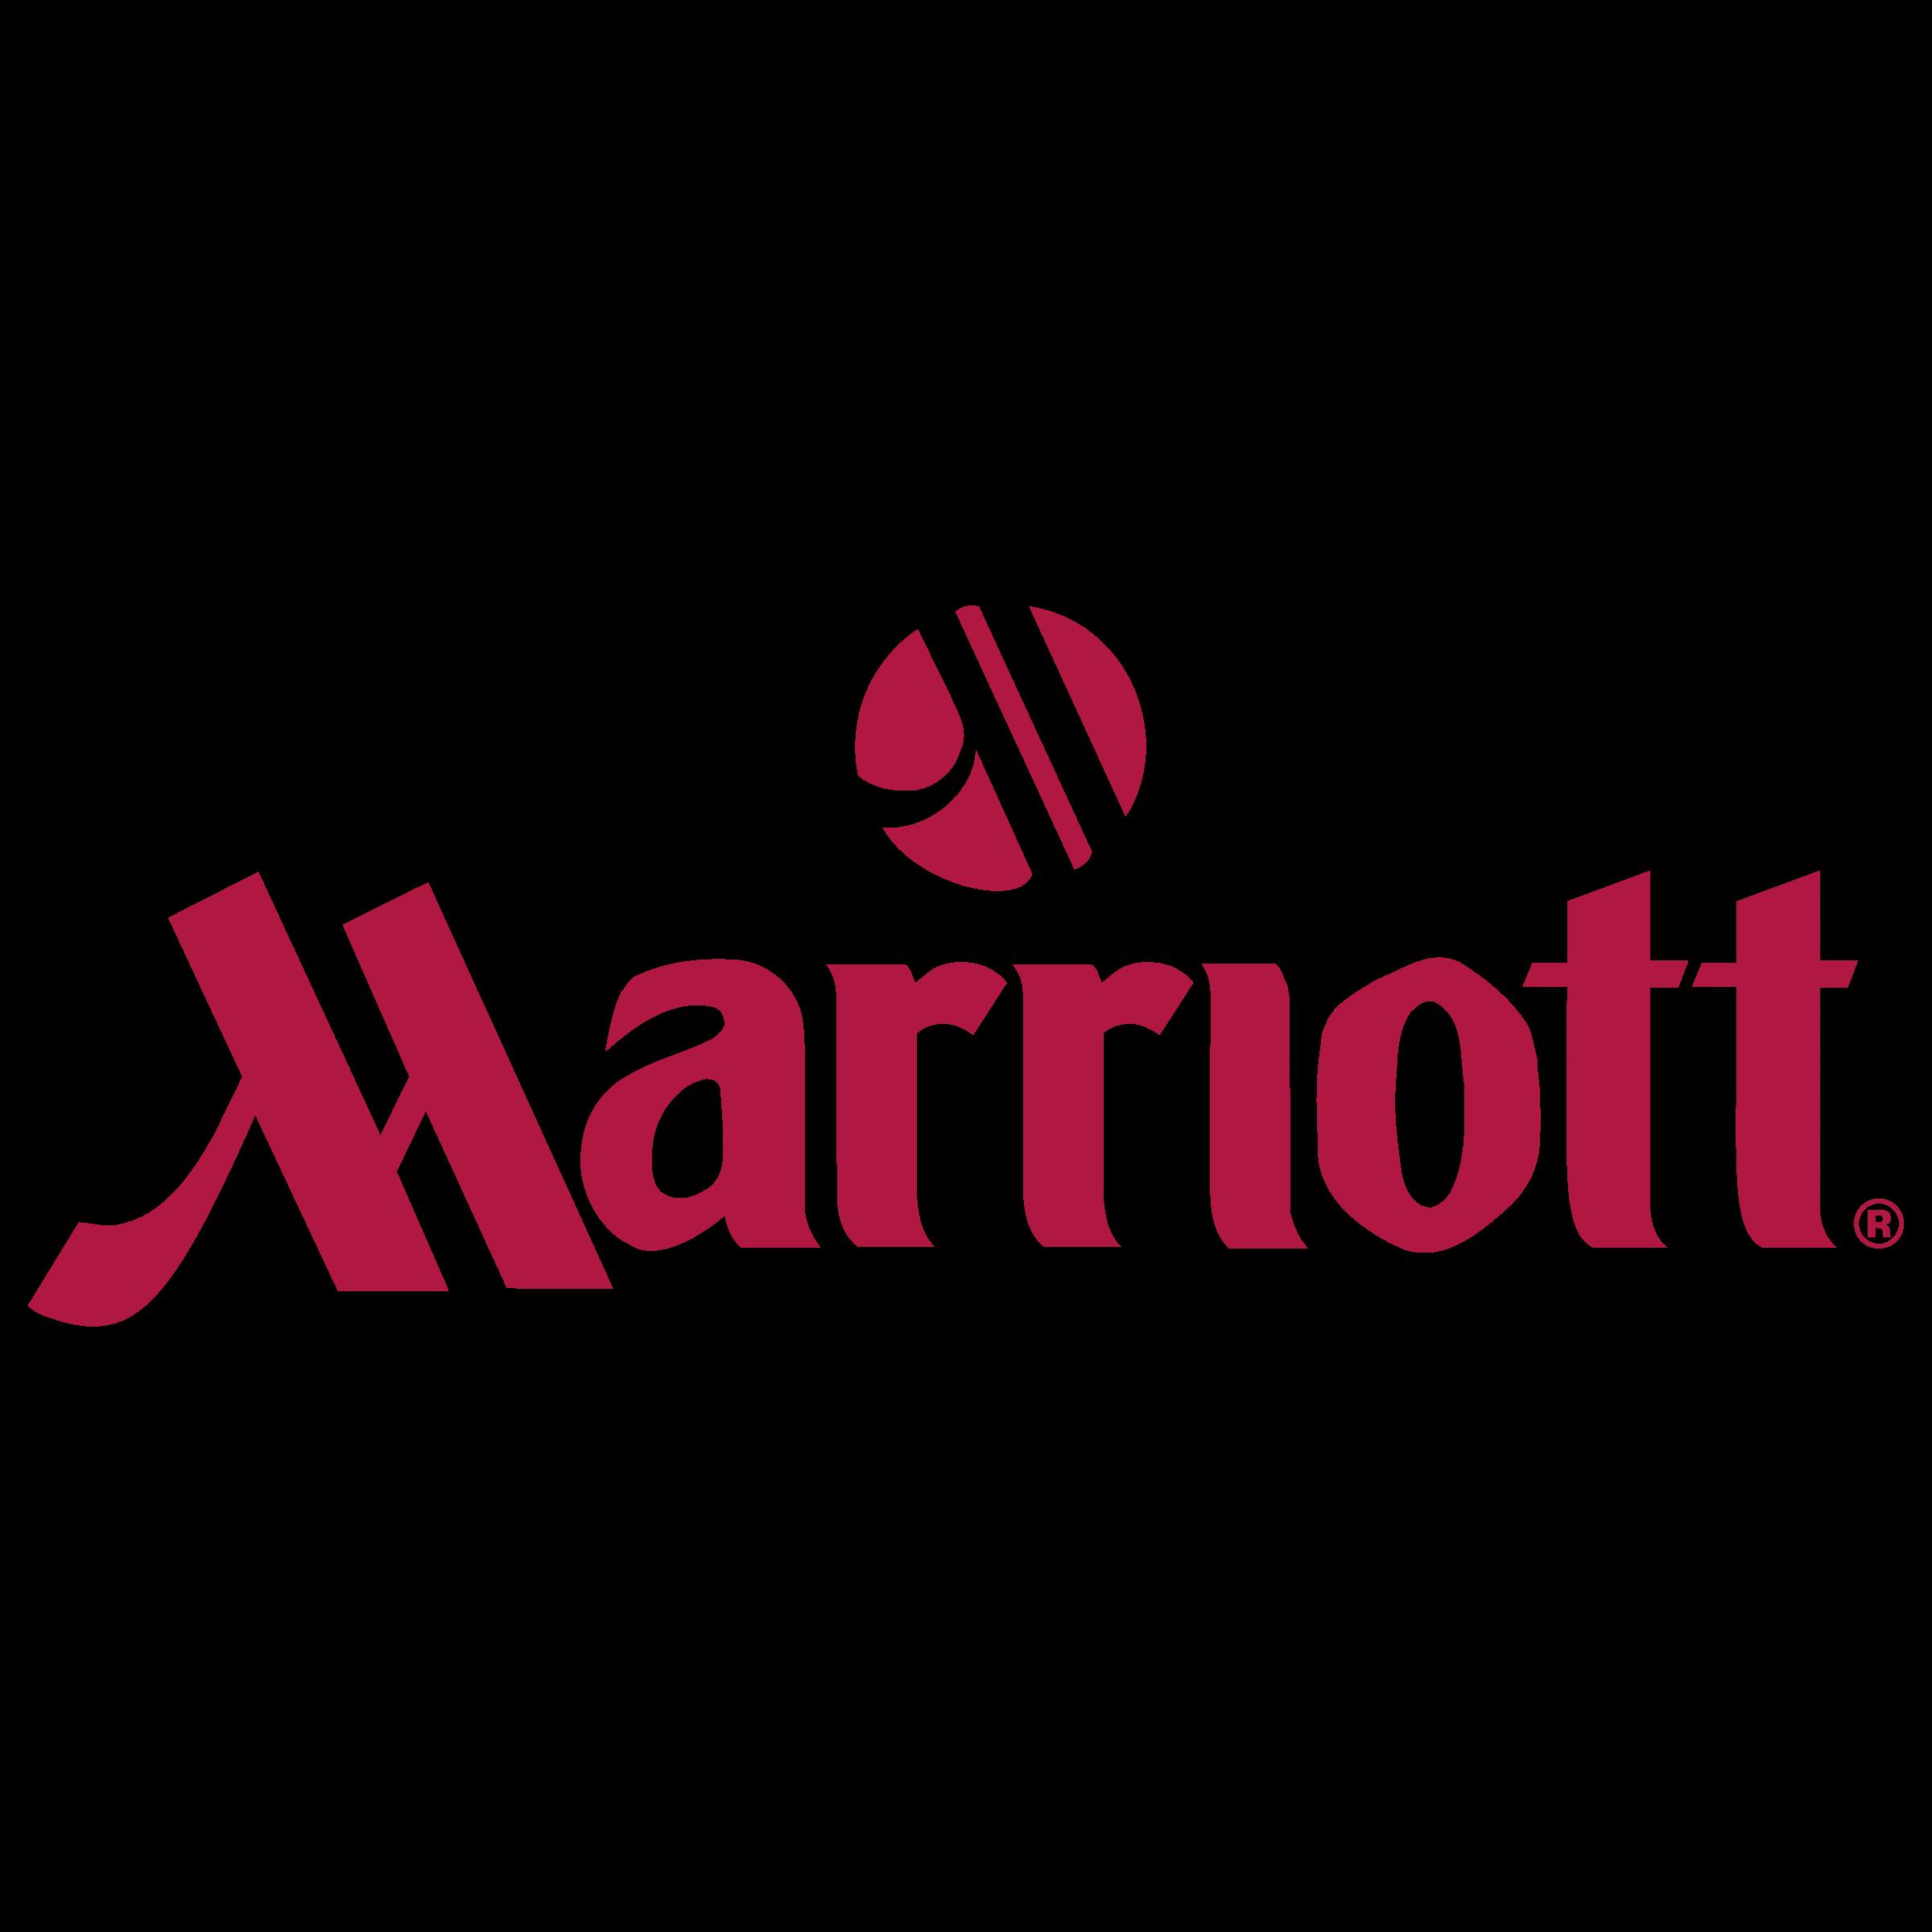 Marriott Logo PNG Transparent & SVG Vector - Freebie Supply